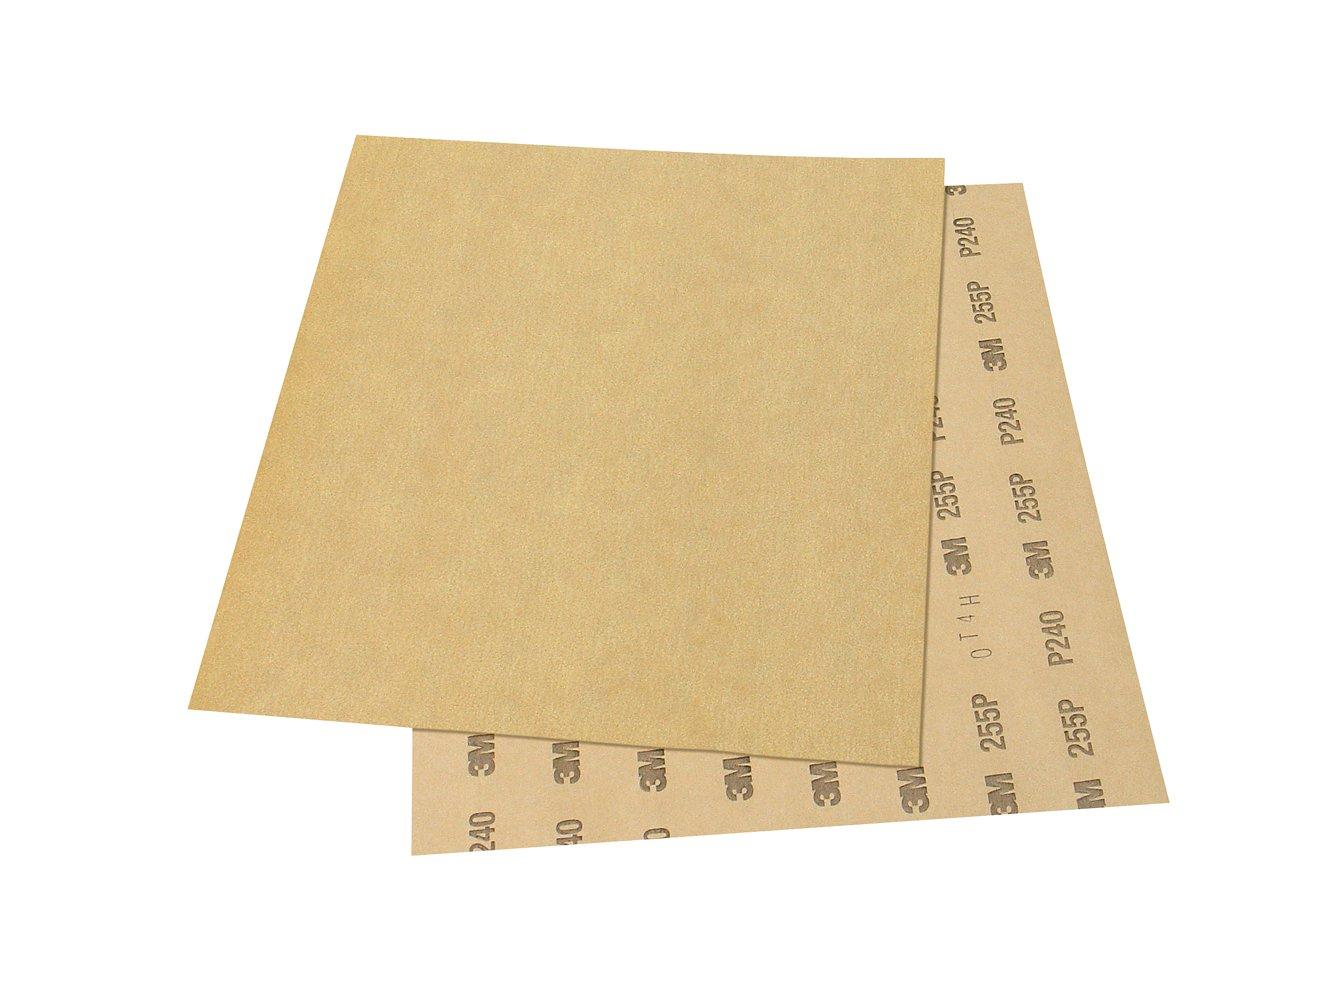 4298 Papier abrasif universel SandBlaster beige 3/m